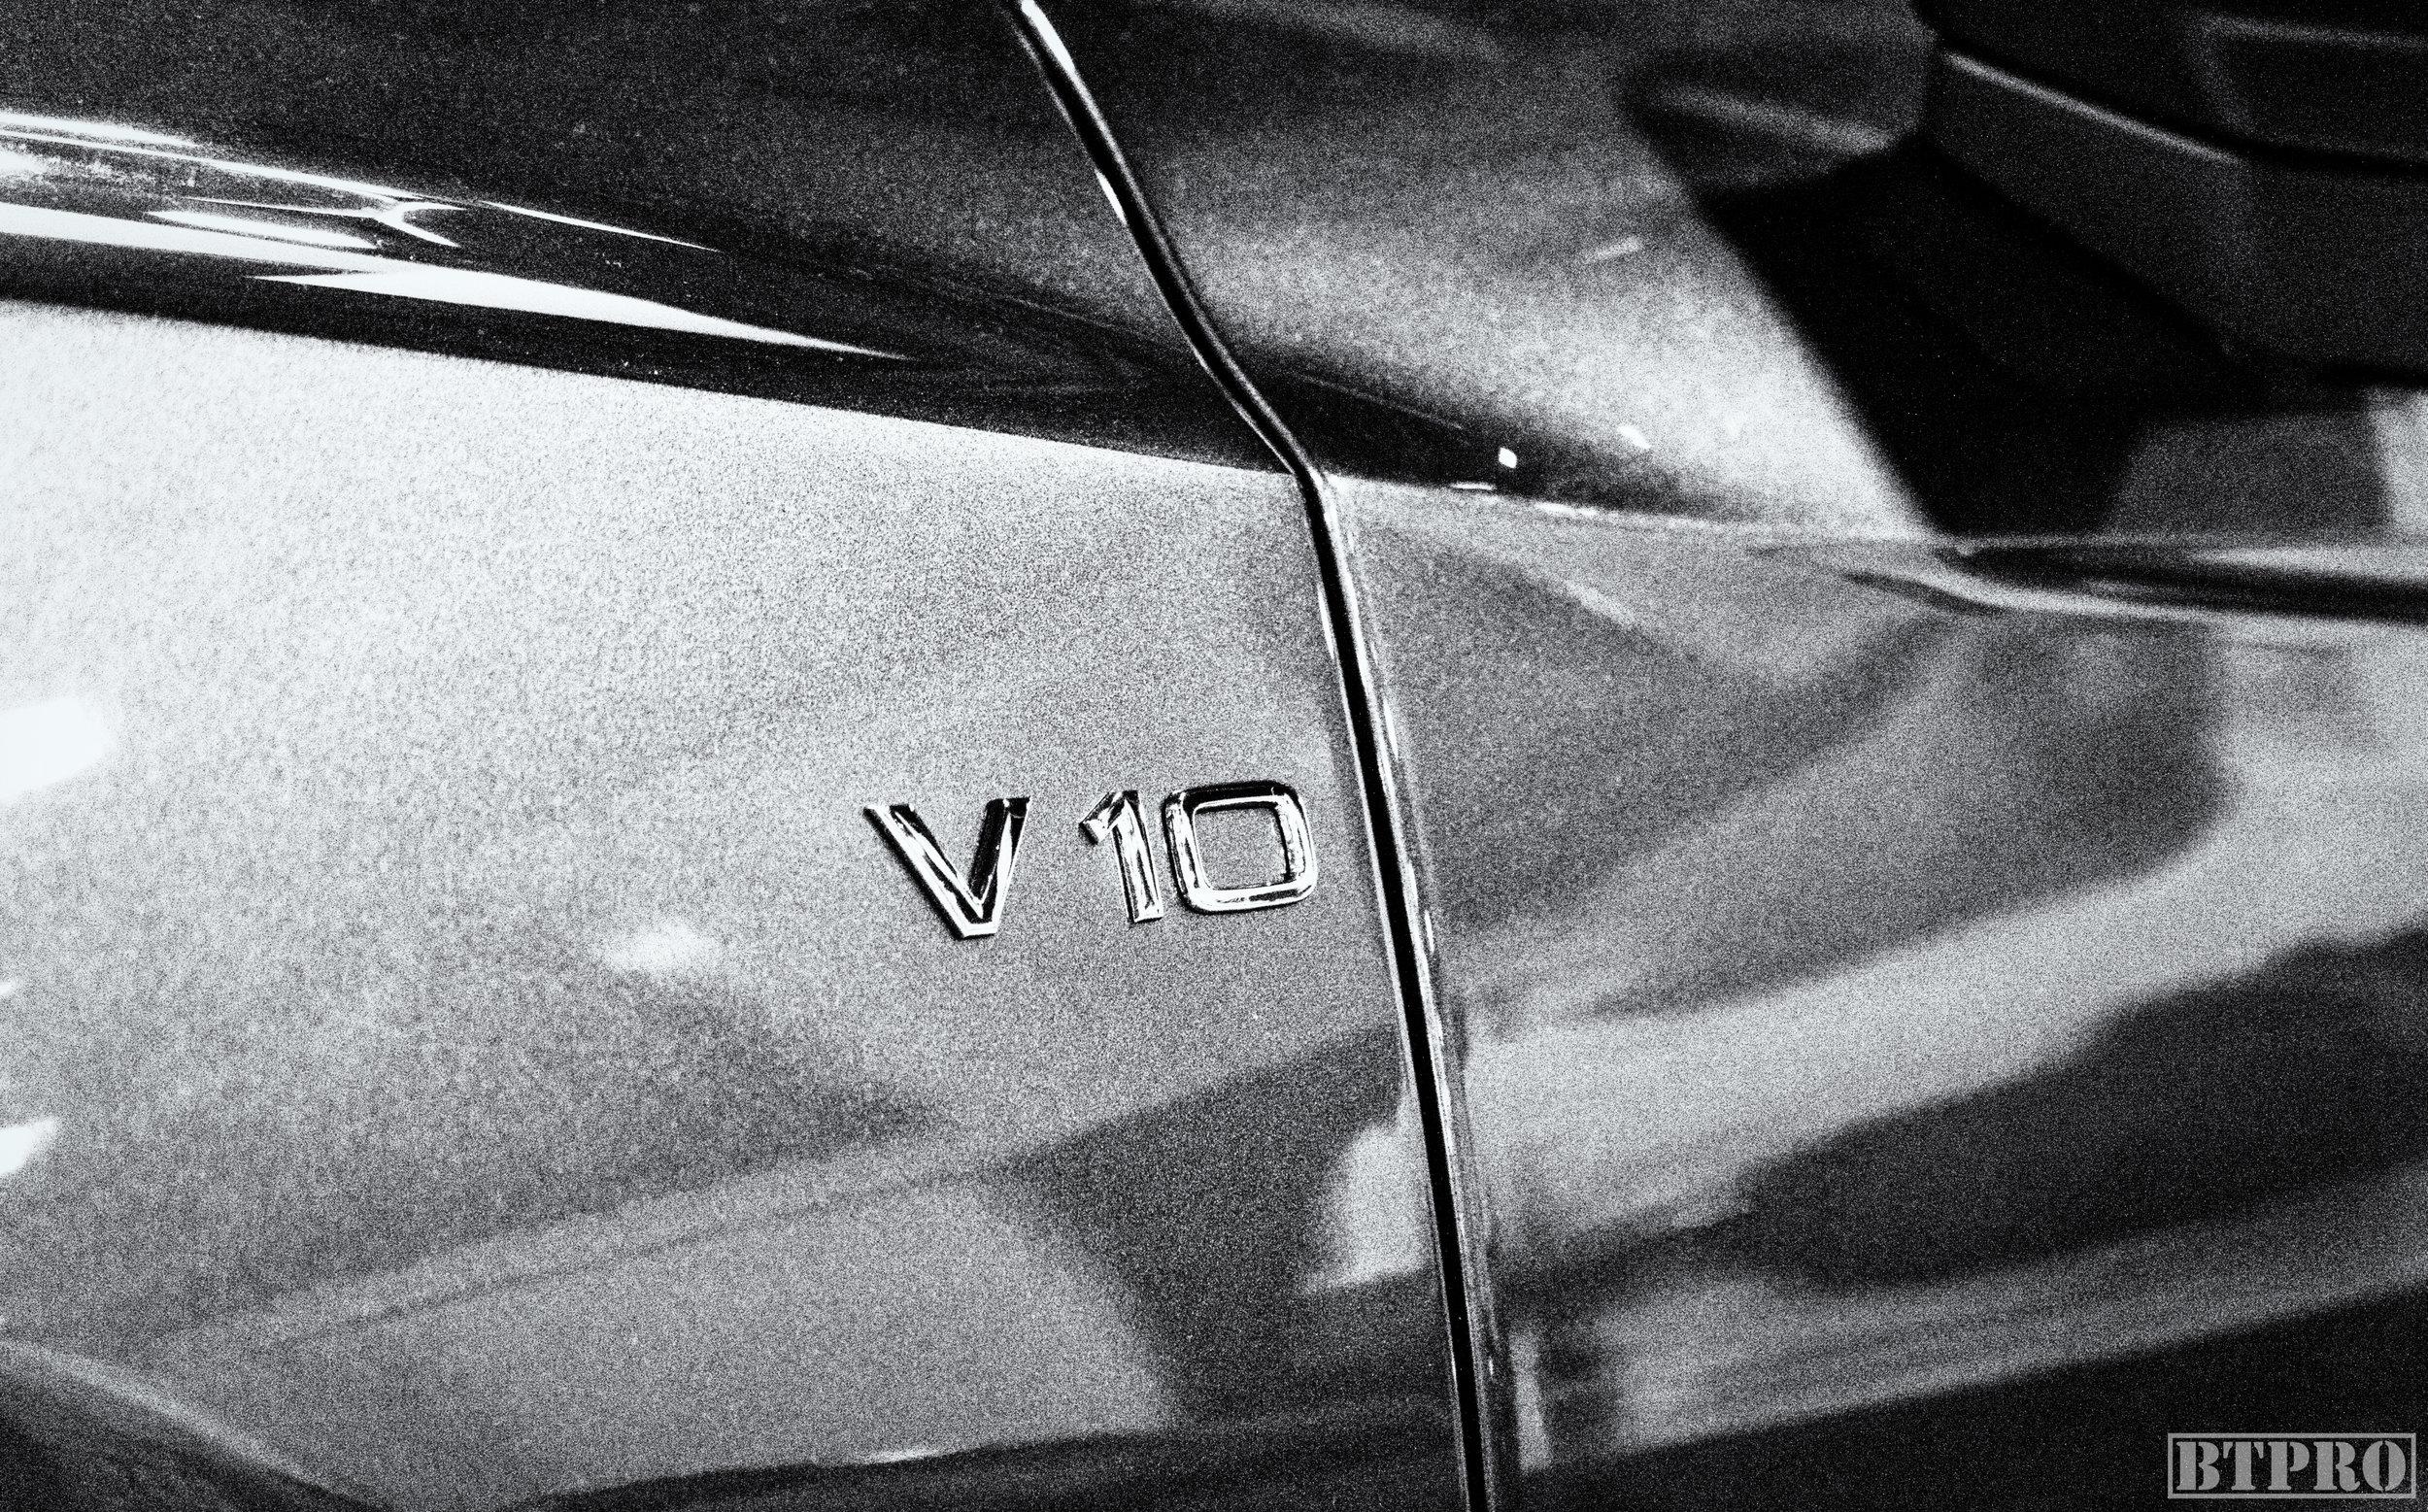 audi, audi r8, r8, car show, miami, miami international car show, miami international auto show, auto show, exotic cars, muscle cars, car photography